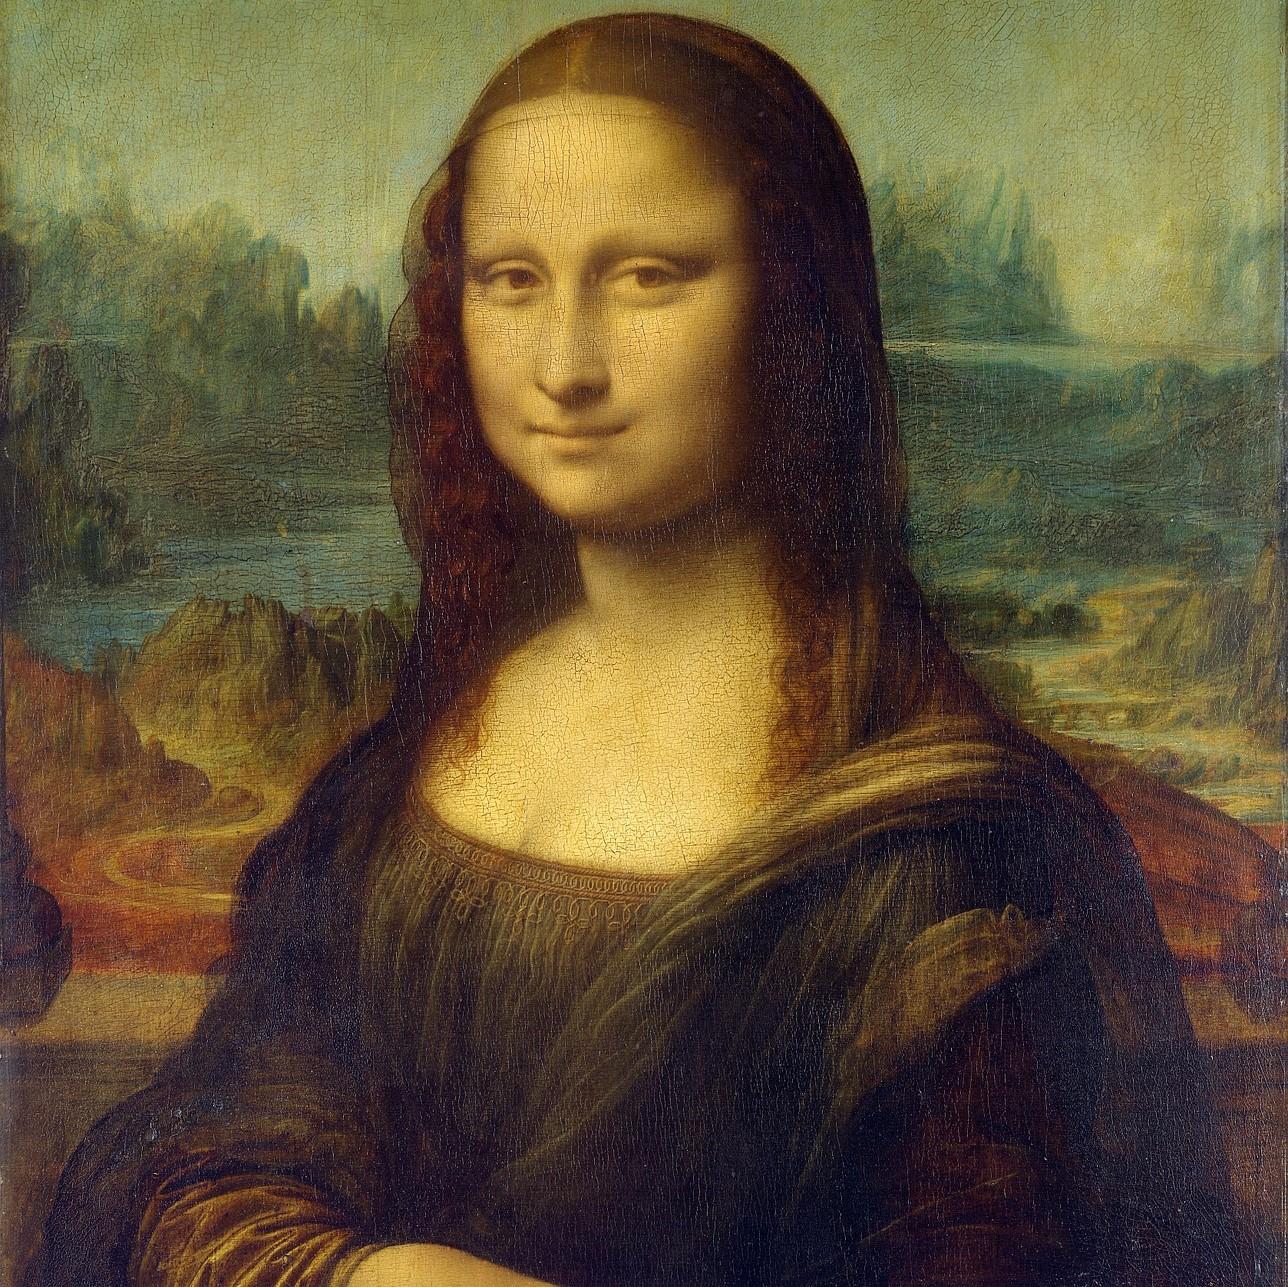 De grote drie: Leonardo da Vinci, Michelangelo en Raphael